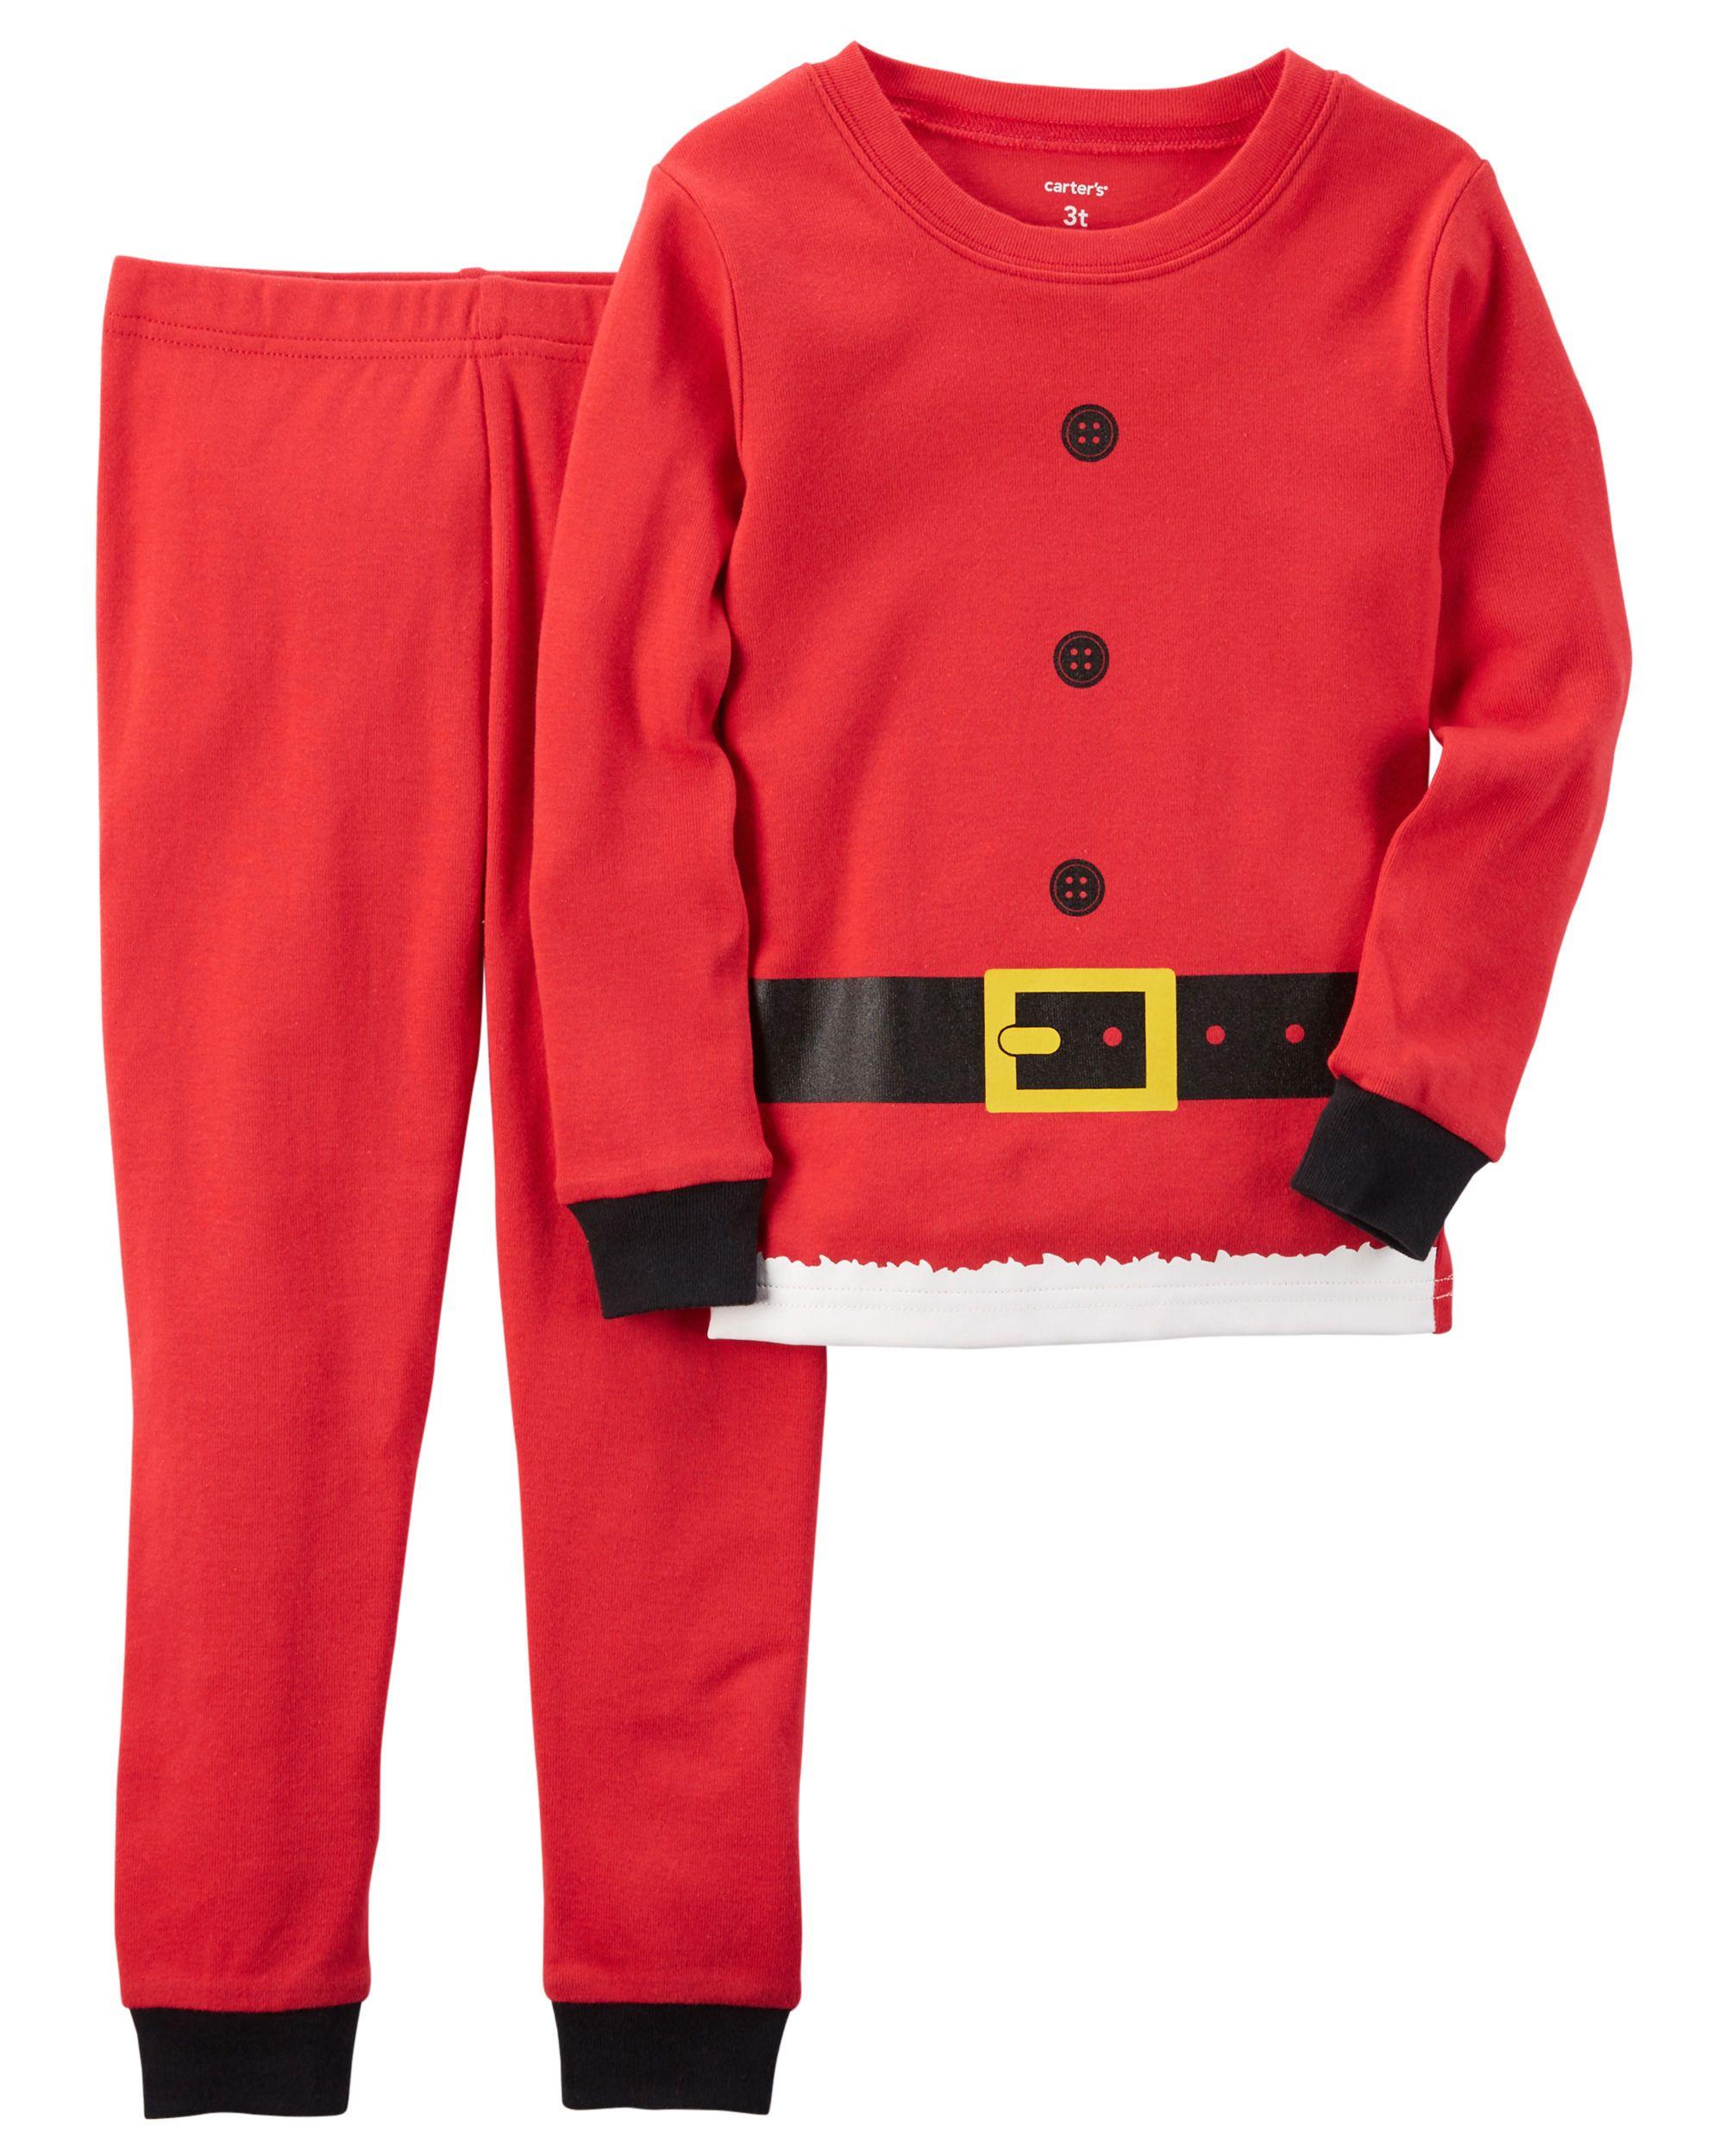 3db91d3fc70b Toddler Boy 2-Piece Snug Fit Cotton Christmas PJs